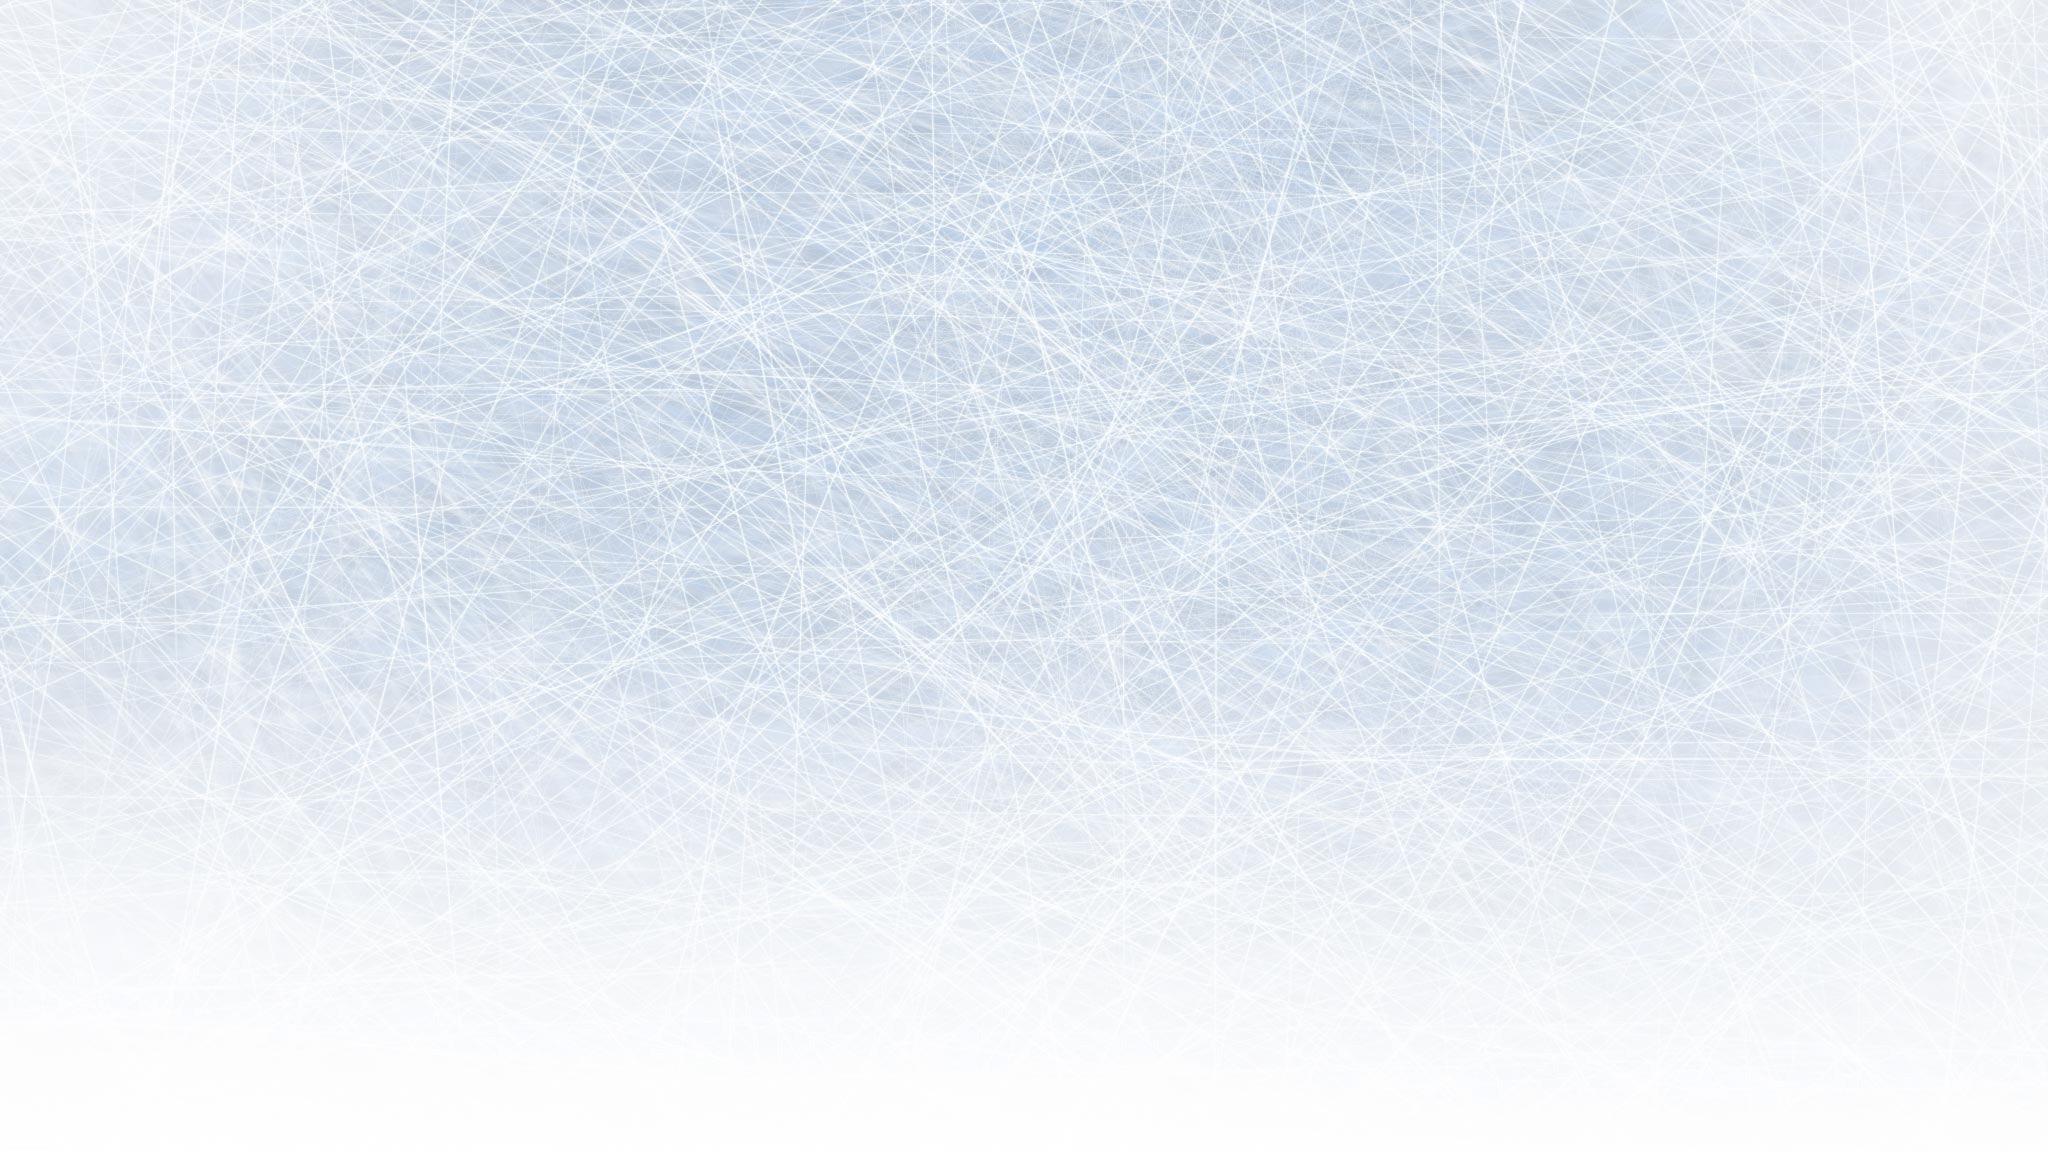 Ice hockey texture